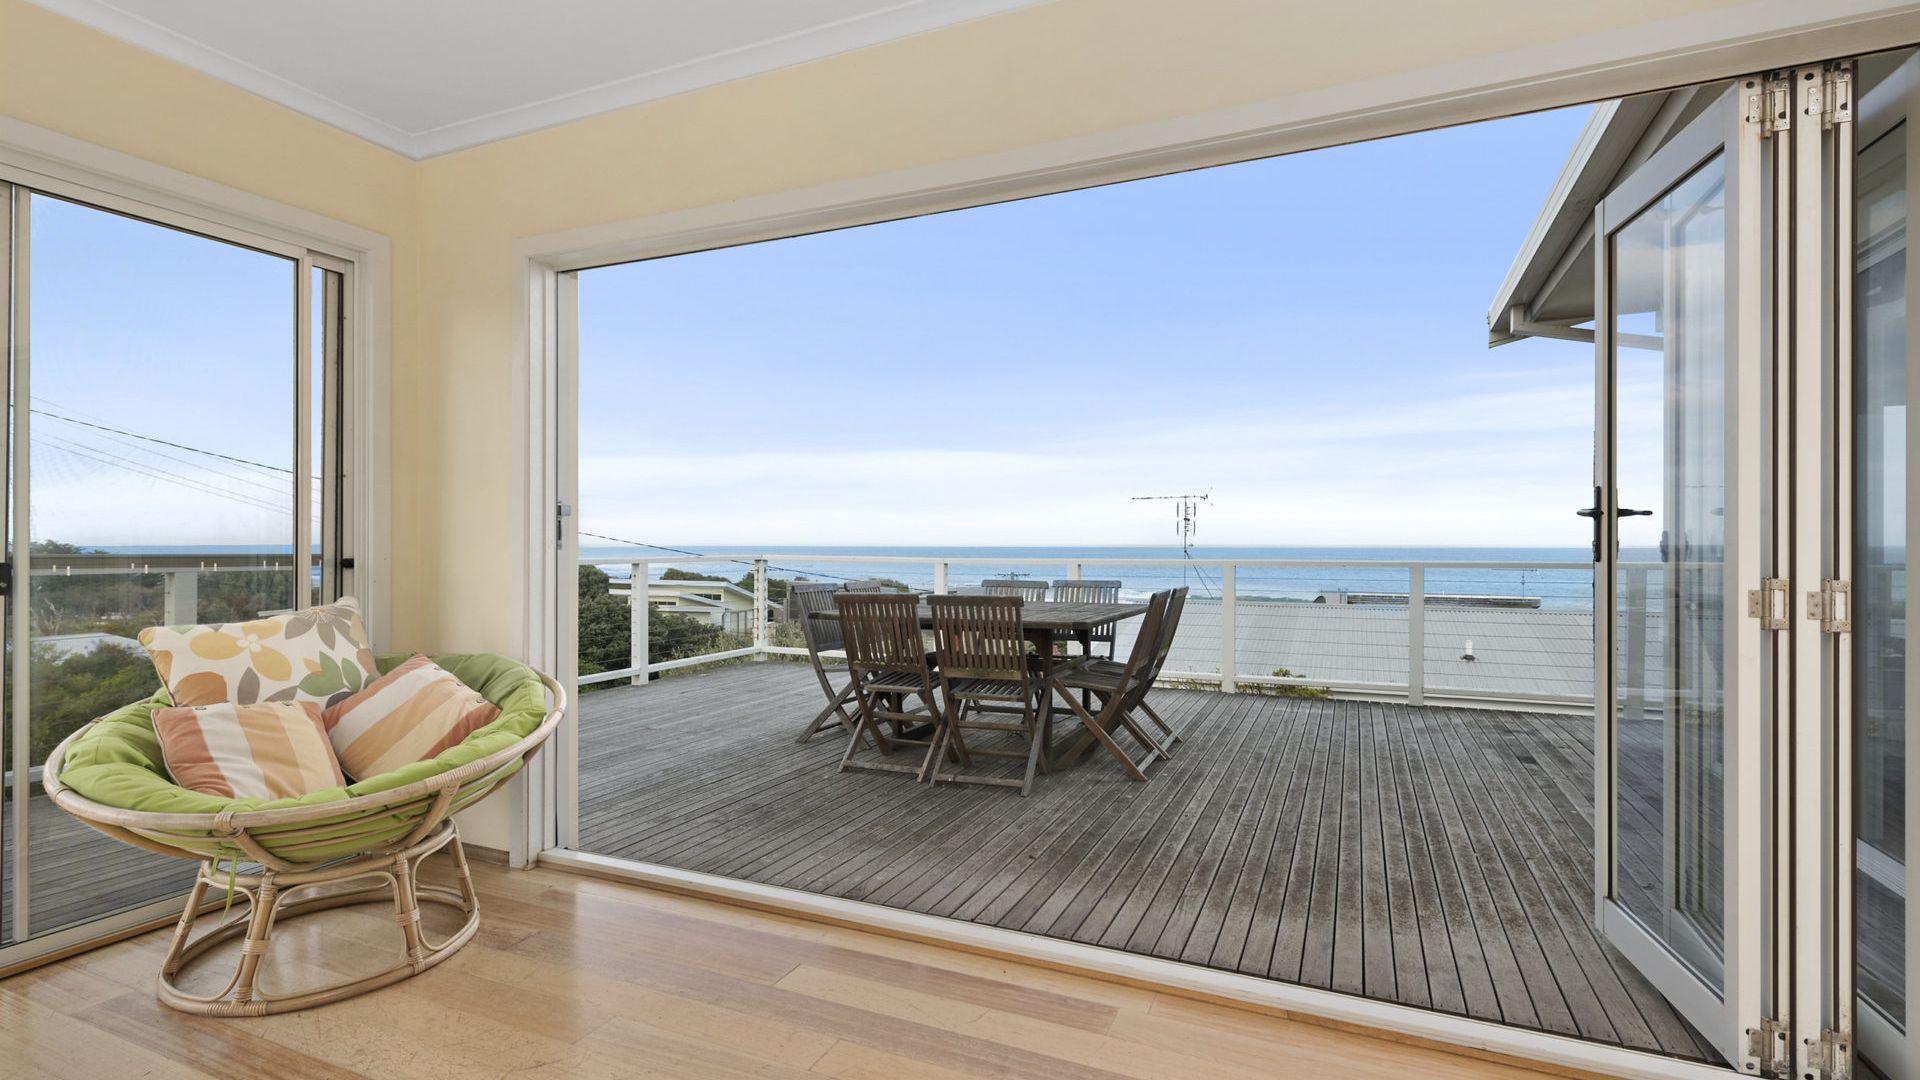 Marengo Beach House